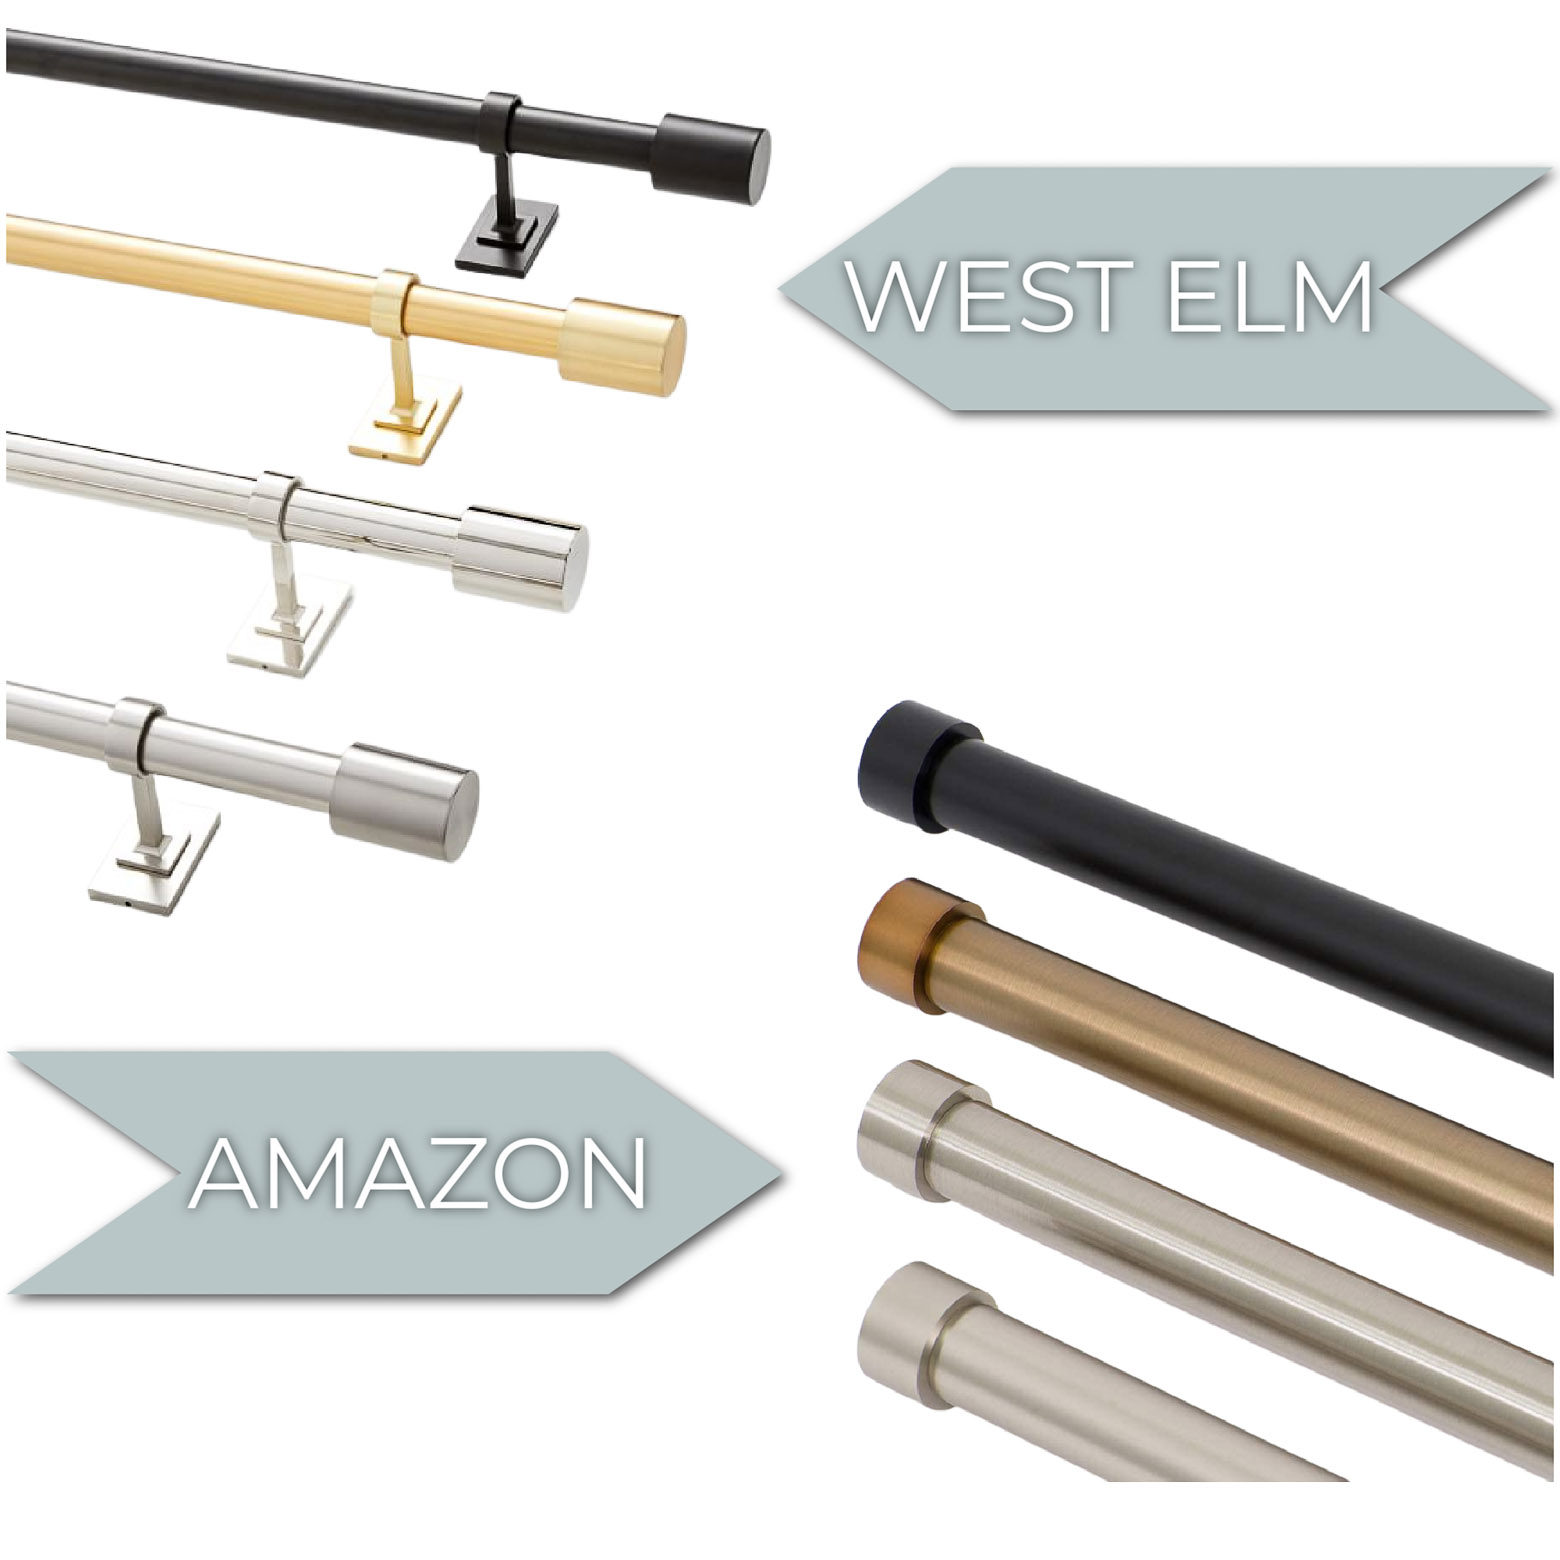 Modern Curtain Rod Comparison -- Amazon vs. West Elm Curtain Rods